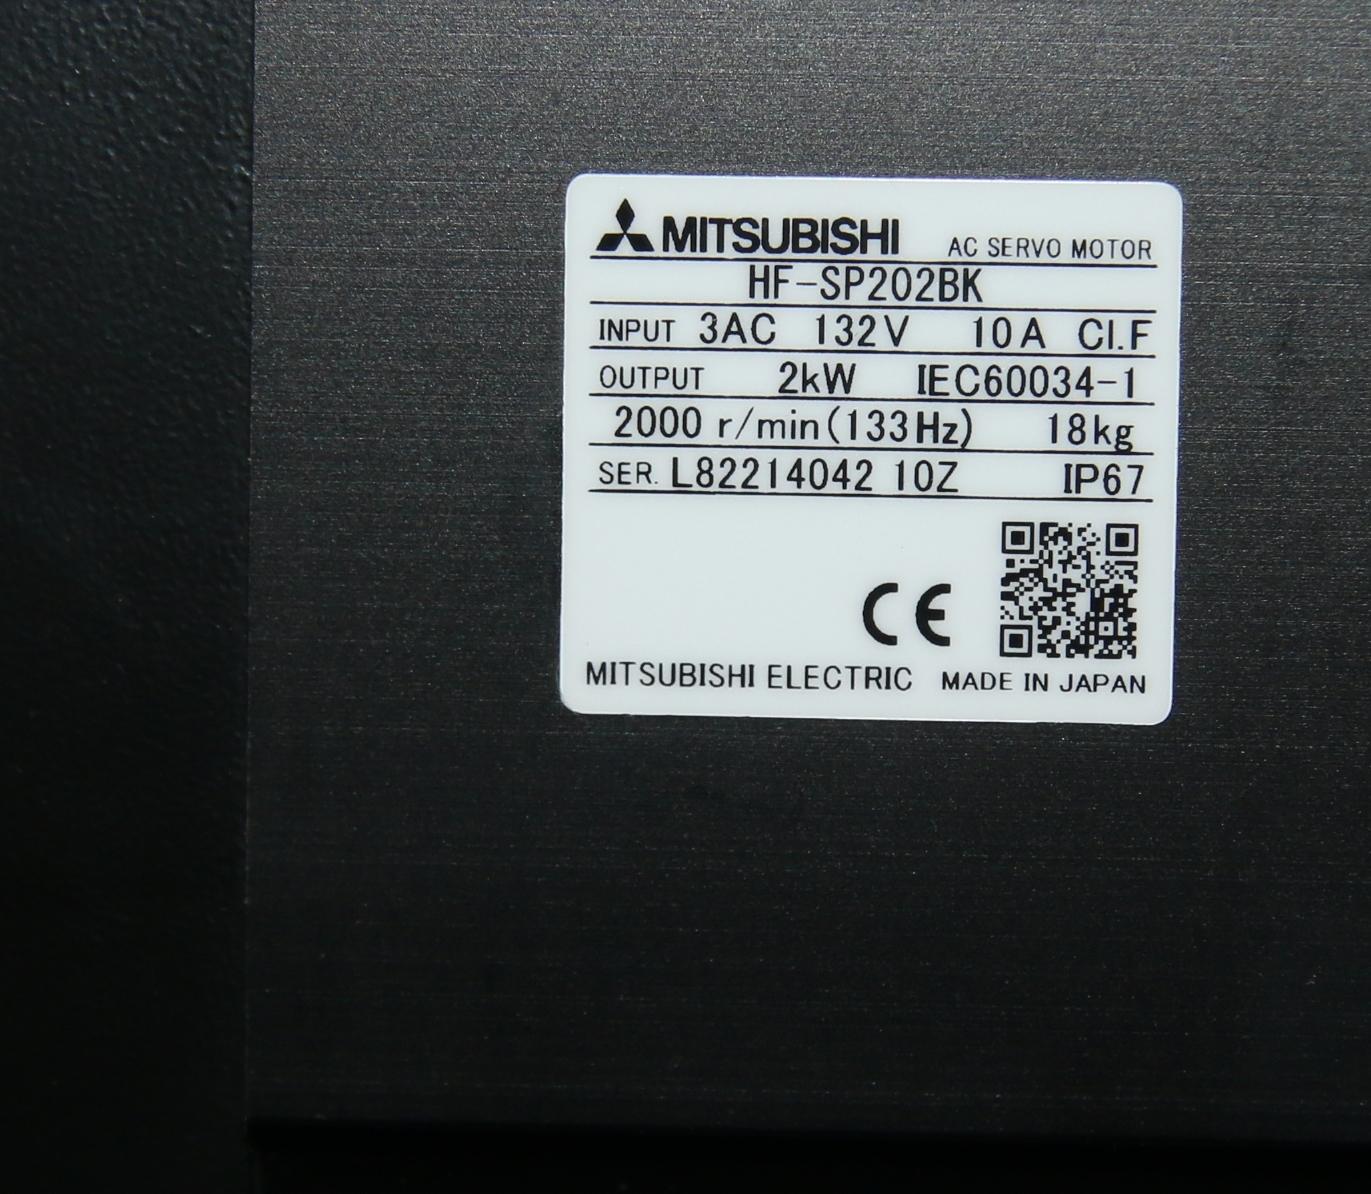 (1) New Mitsubishi HF-SP202BK AC Servo Motor 15116